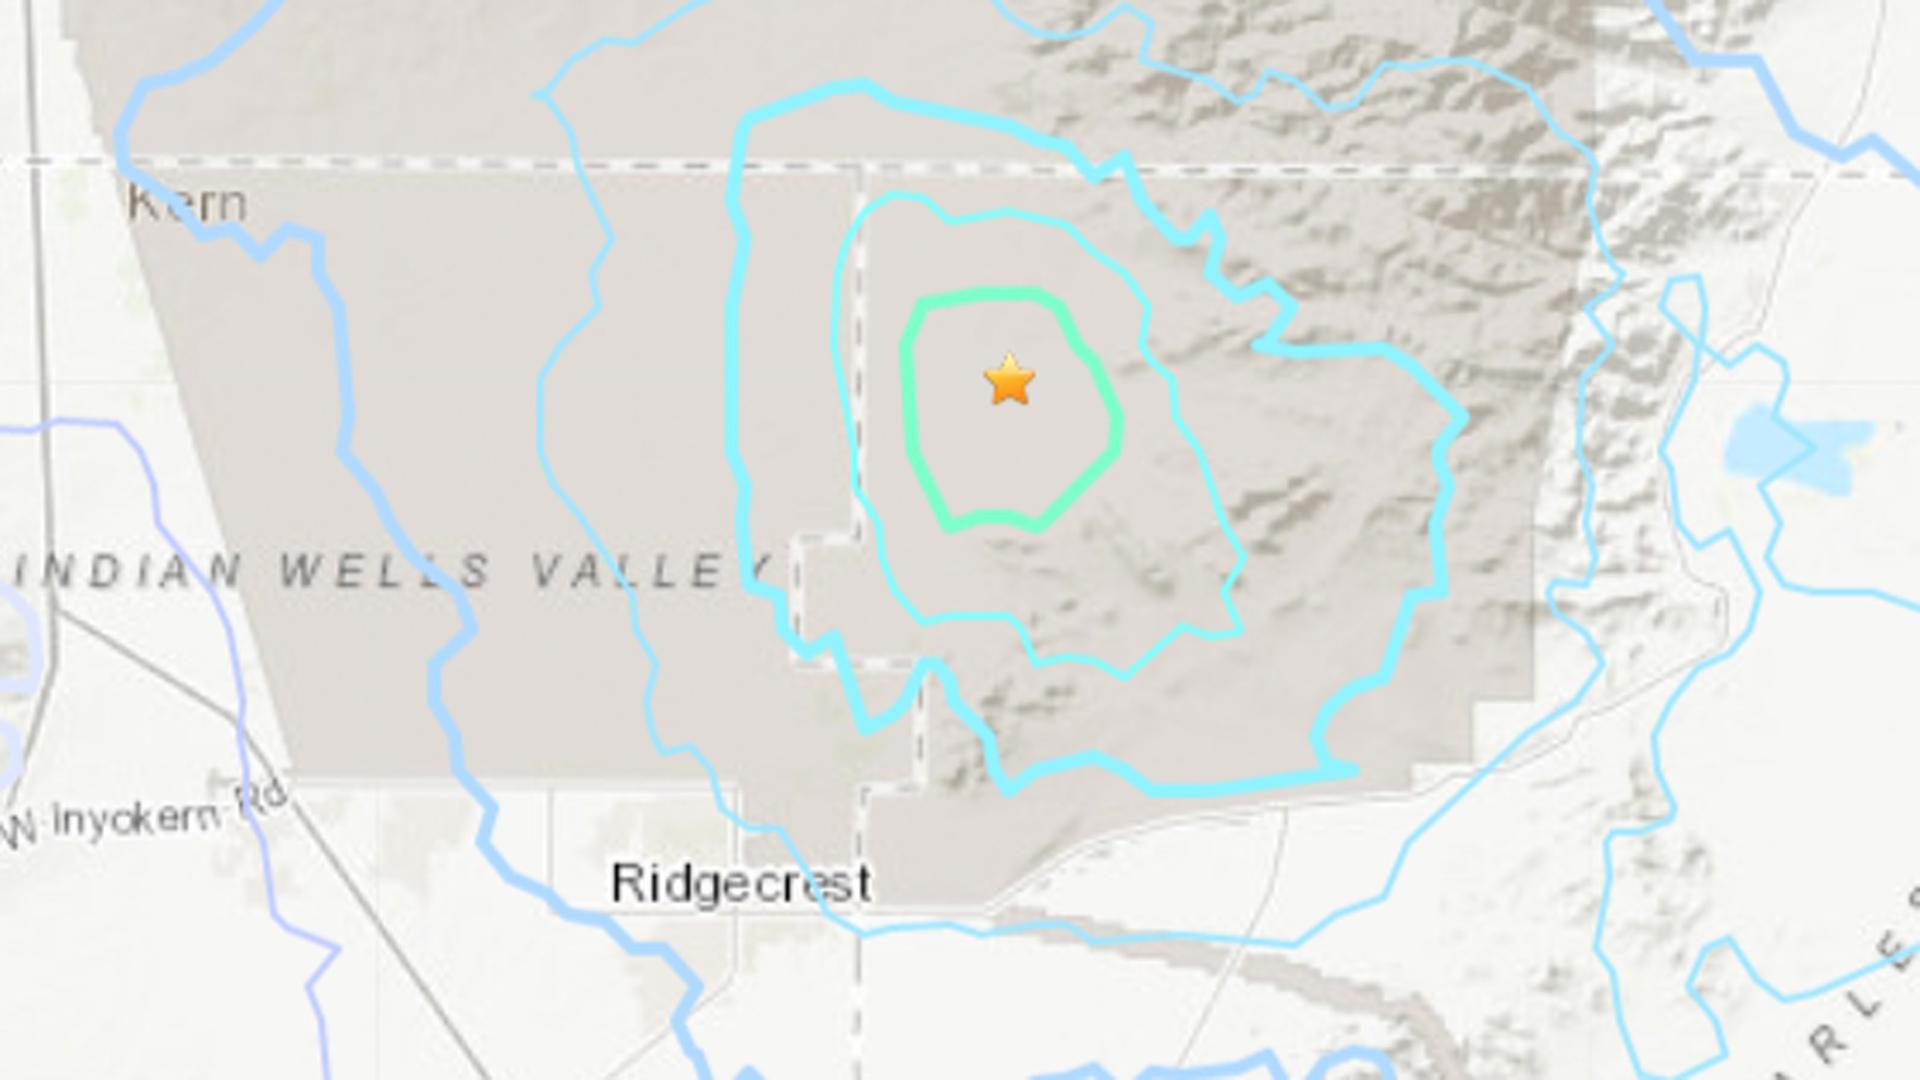 A 3.5 magnitude earthquake struck near Ridgecrest on Nov. 7, 2019. (Credit: USGS)